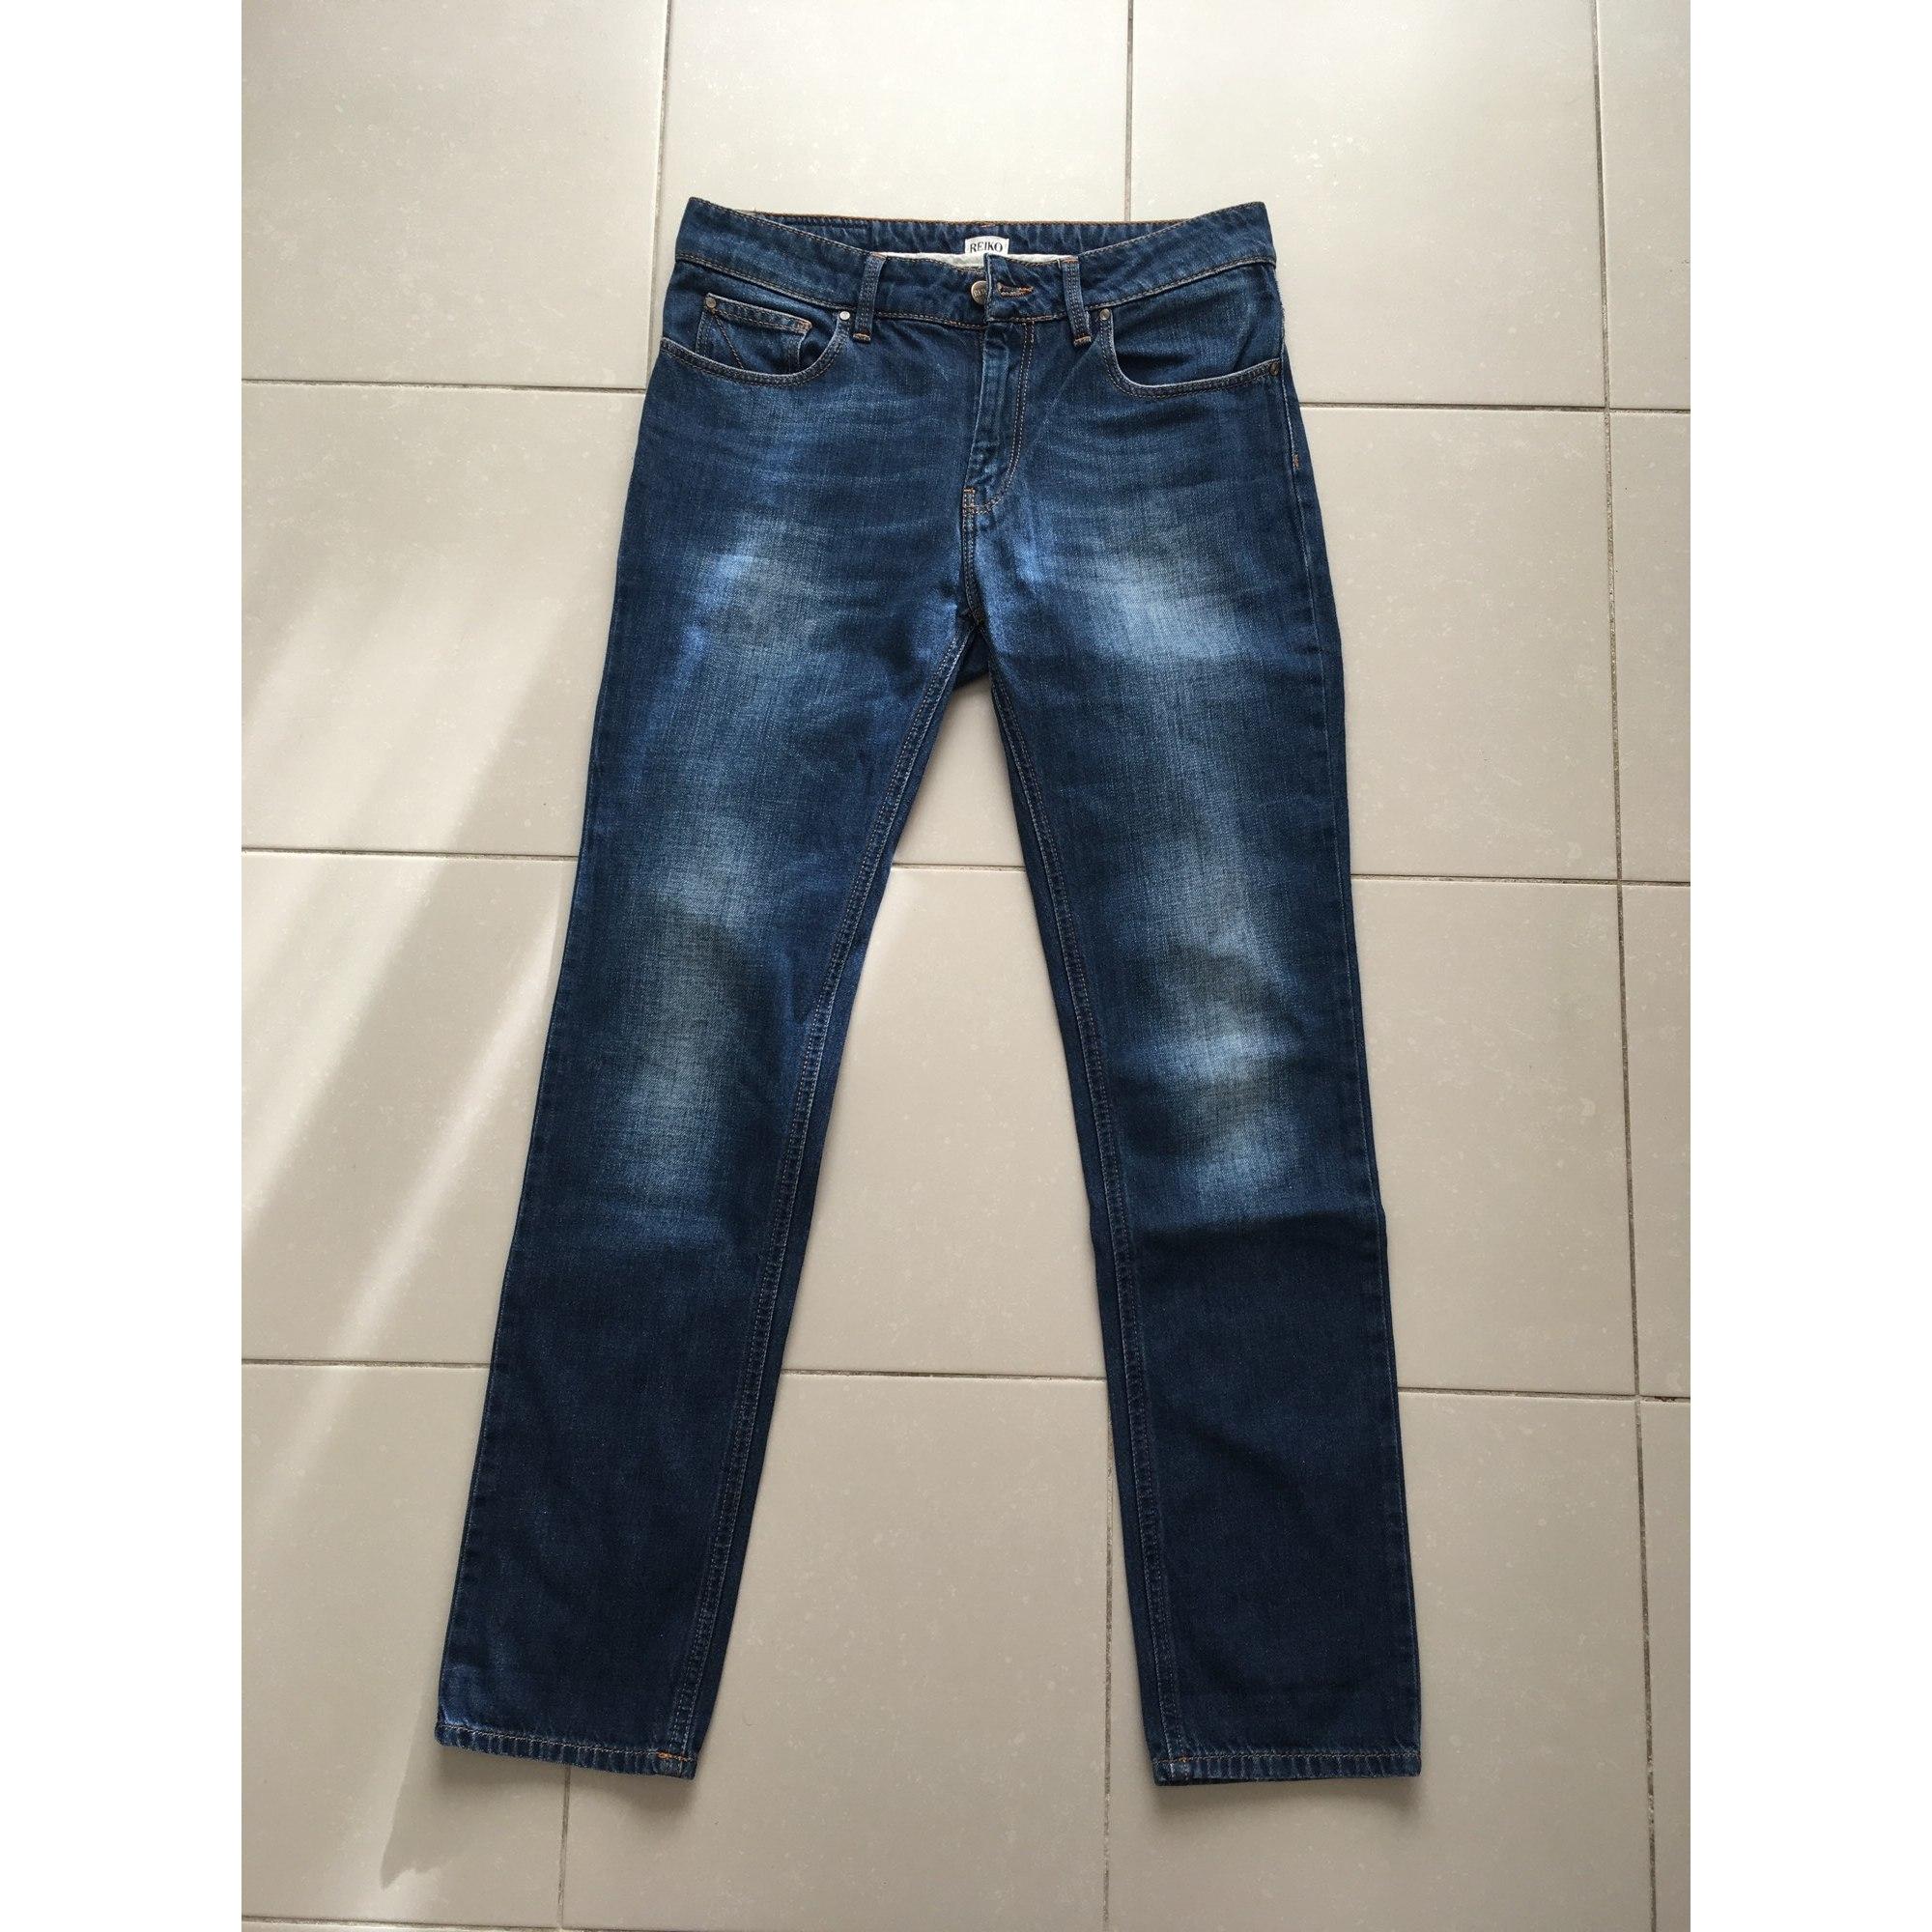 Jeans droit REIKO Bleu, bleu marine, bleu turquoise